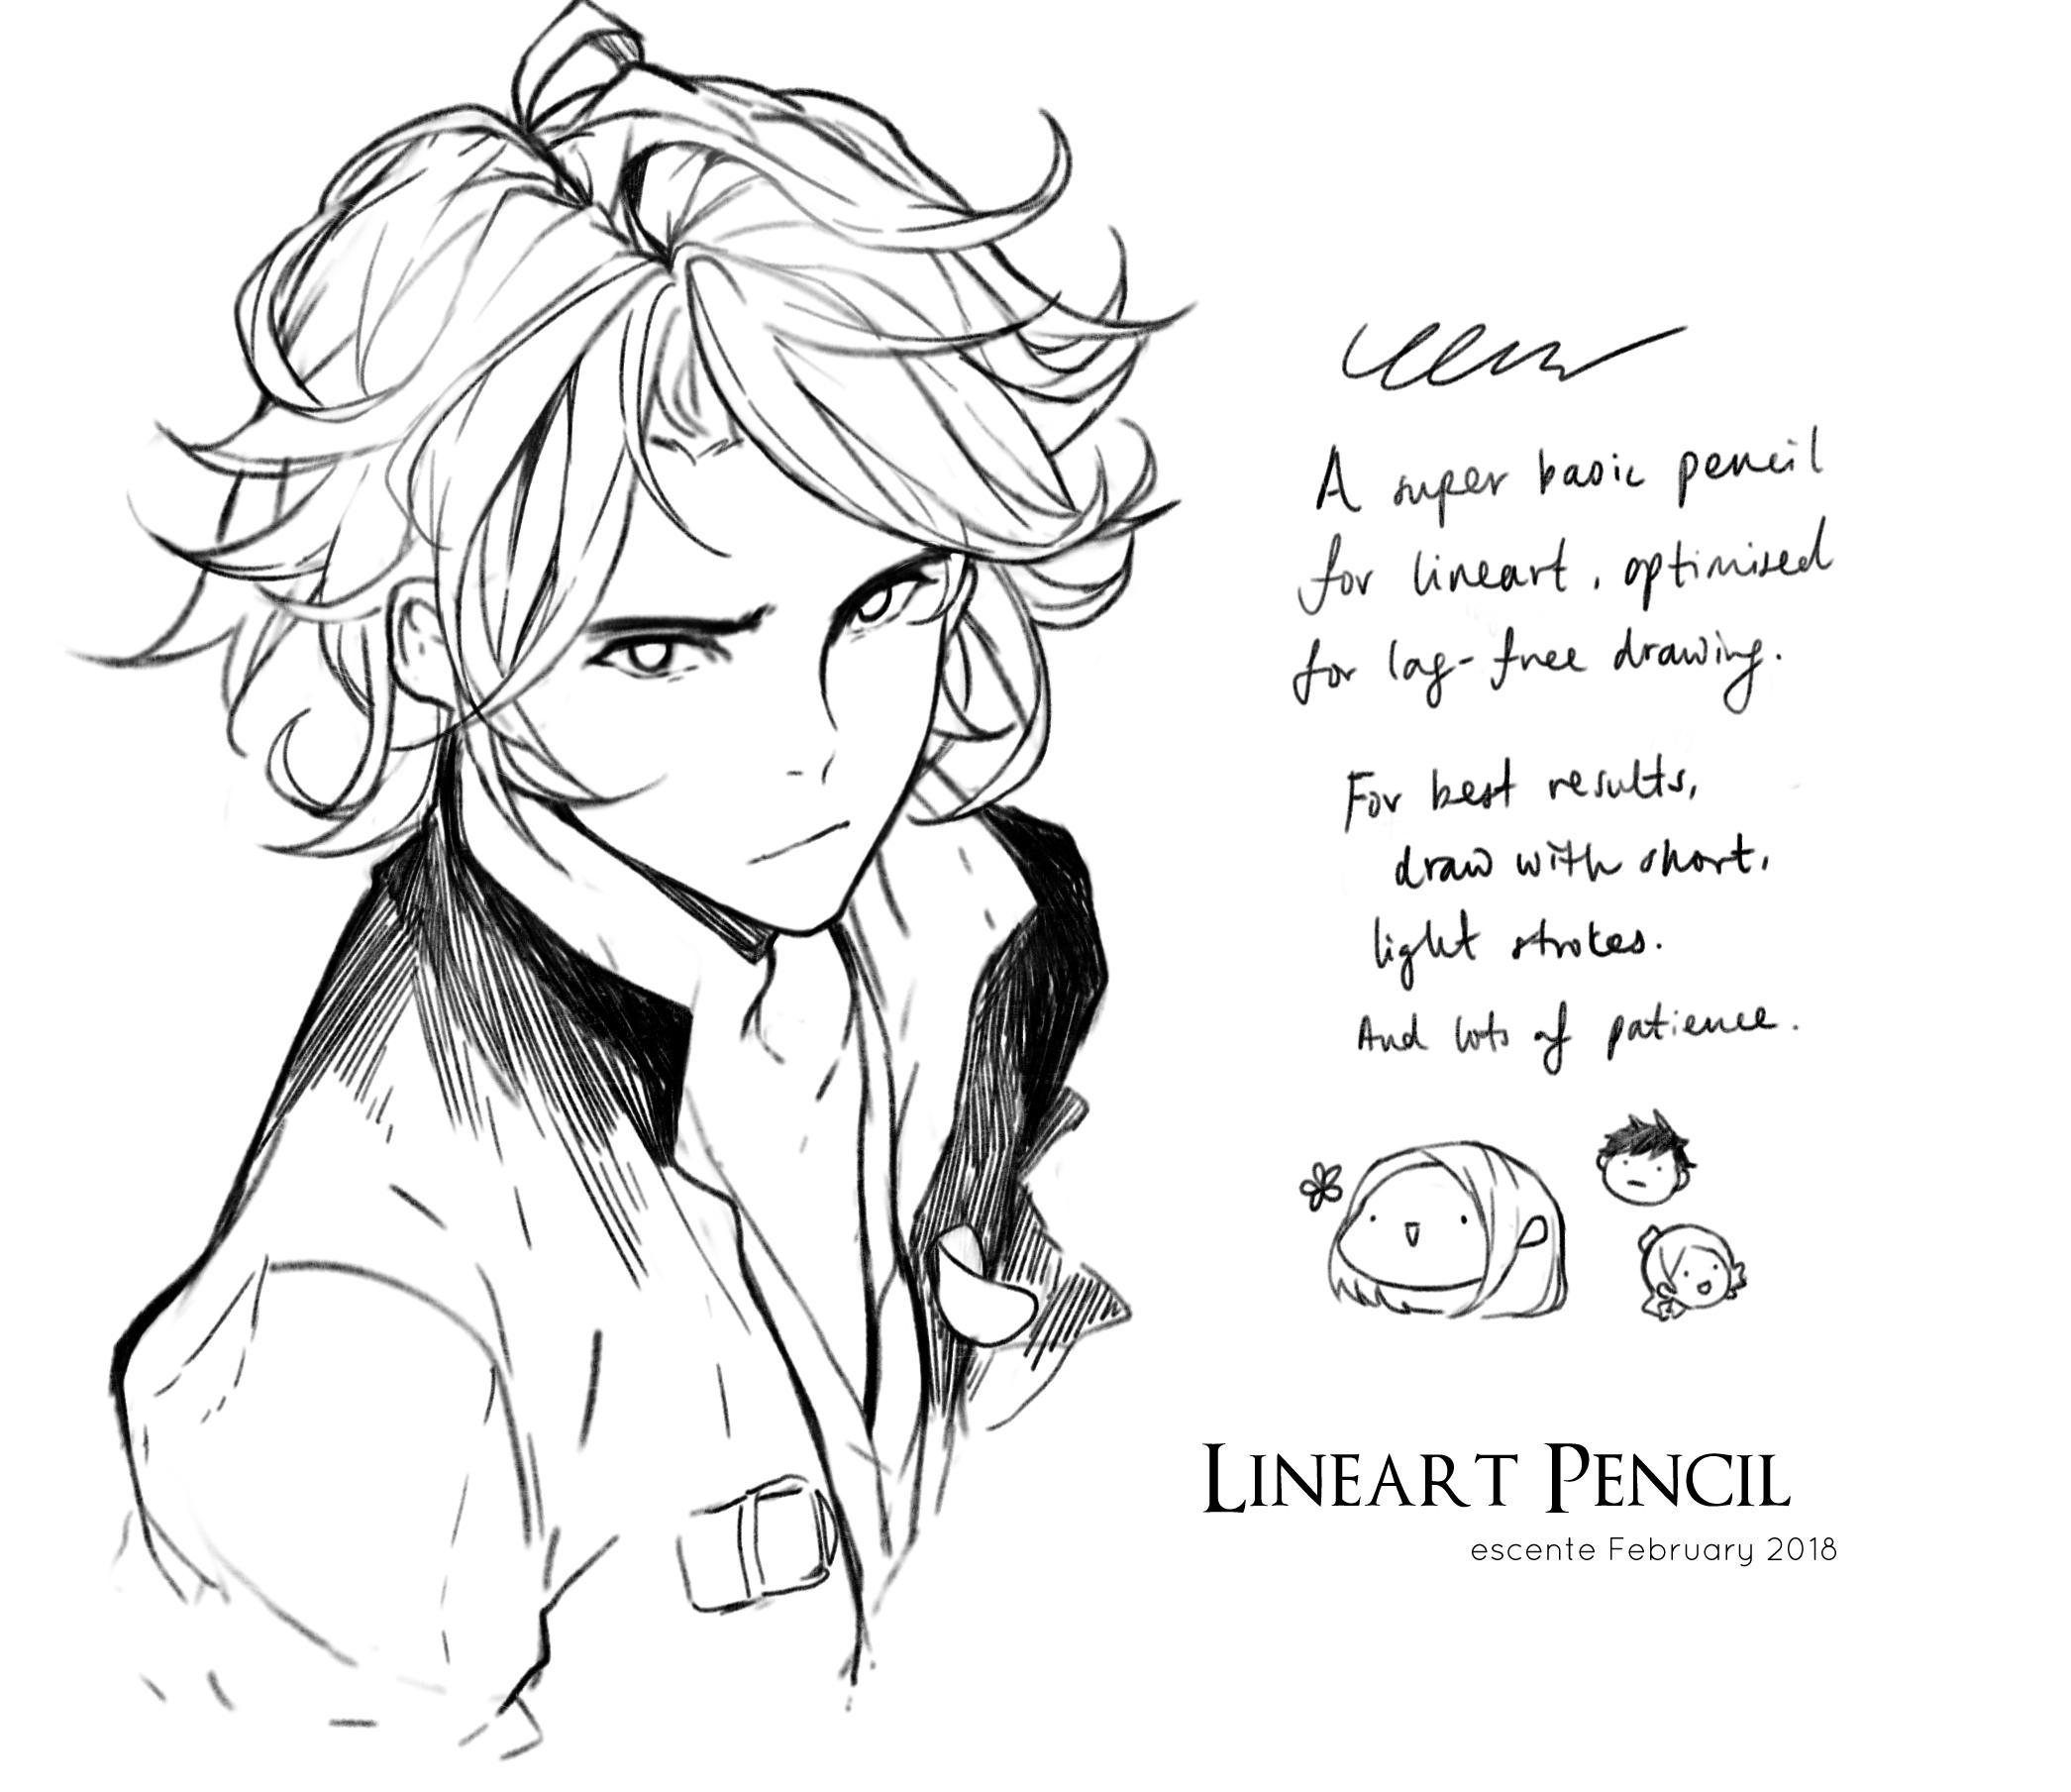 Line Art Brush By Jimro : Keikov f s deviantart favourites